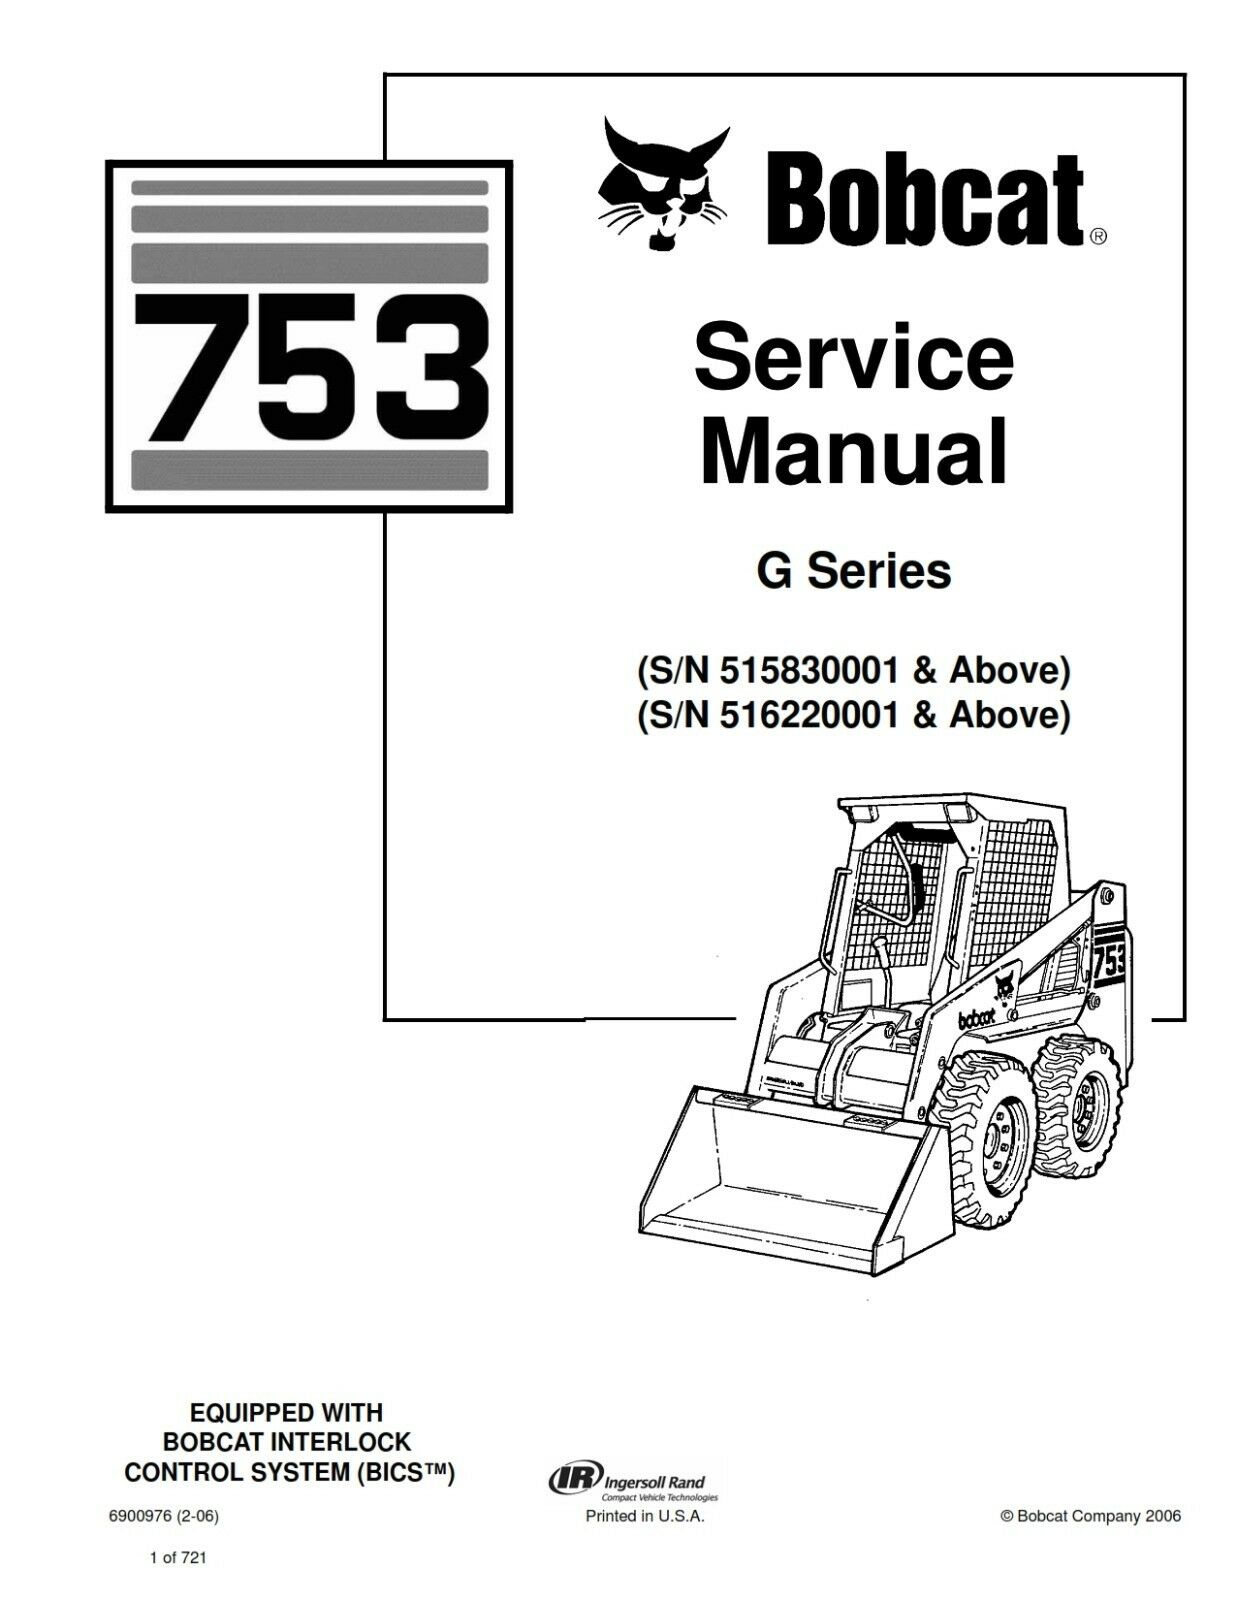 Bobcat skid steer 753g 753 service manual book 6900976 ebay fandeluxe Choice Image